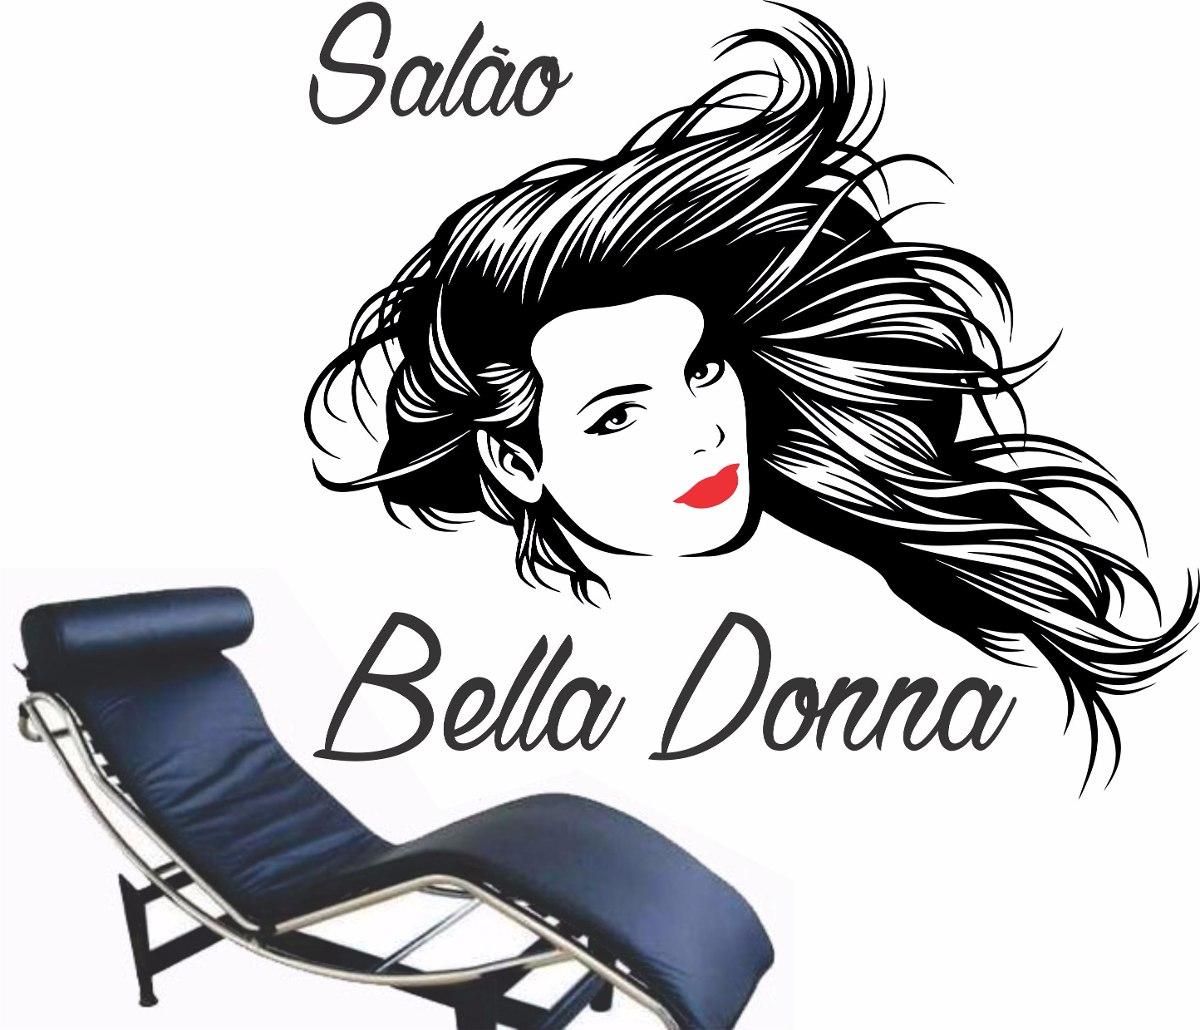 adesivo-parede-salo-beleza-cabelo-personalizado-mulher-11m-D_NQ_NP_881325-MLB25429831036_032017-F.jpg